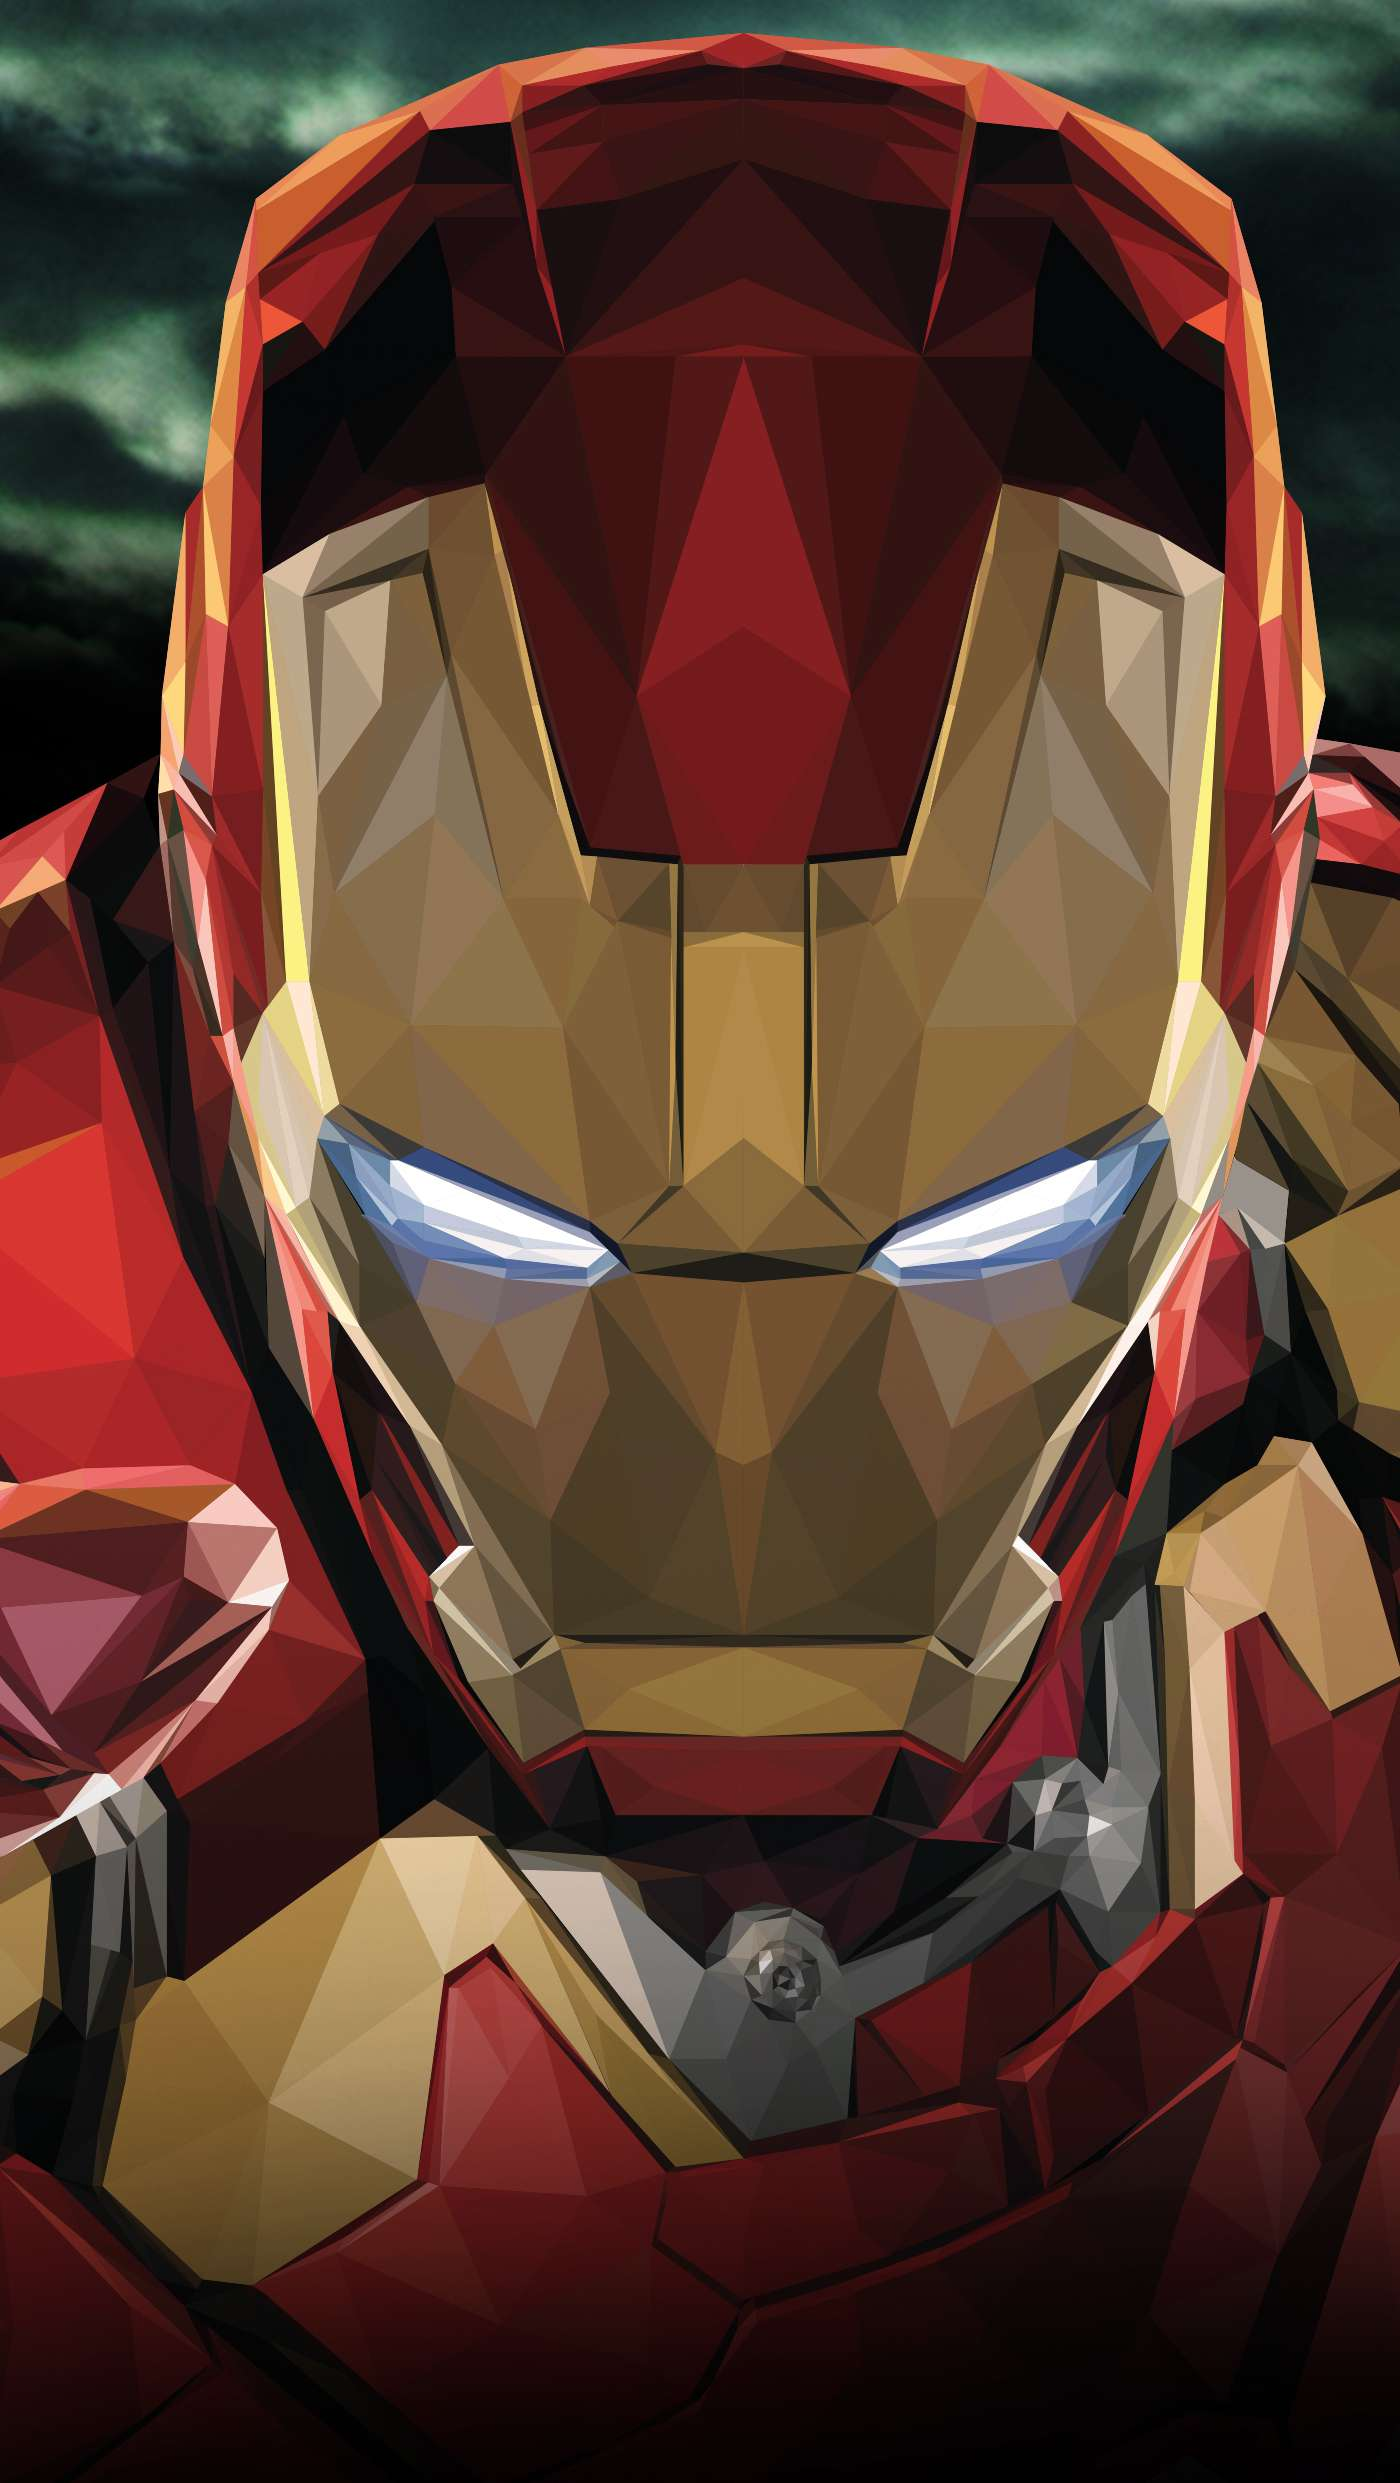 Iron Man Polygon Art iPhone Wallpaper